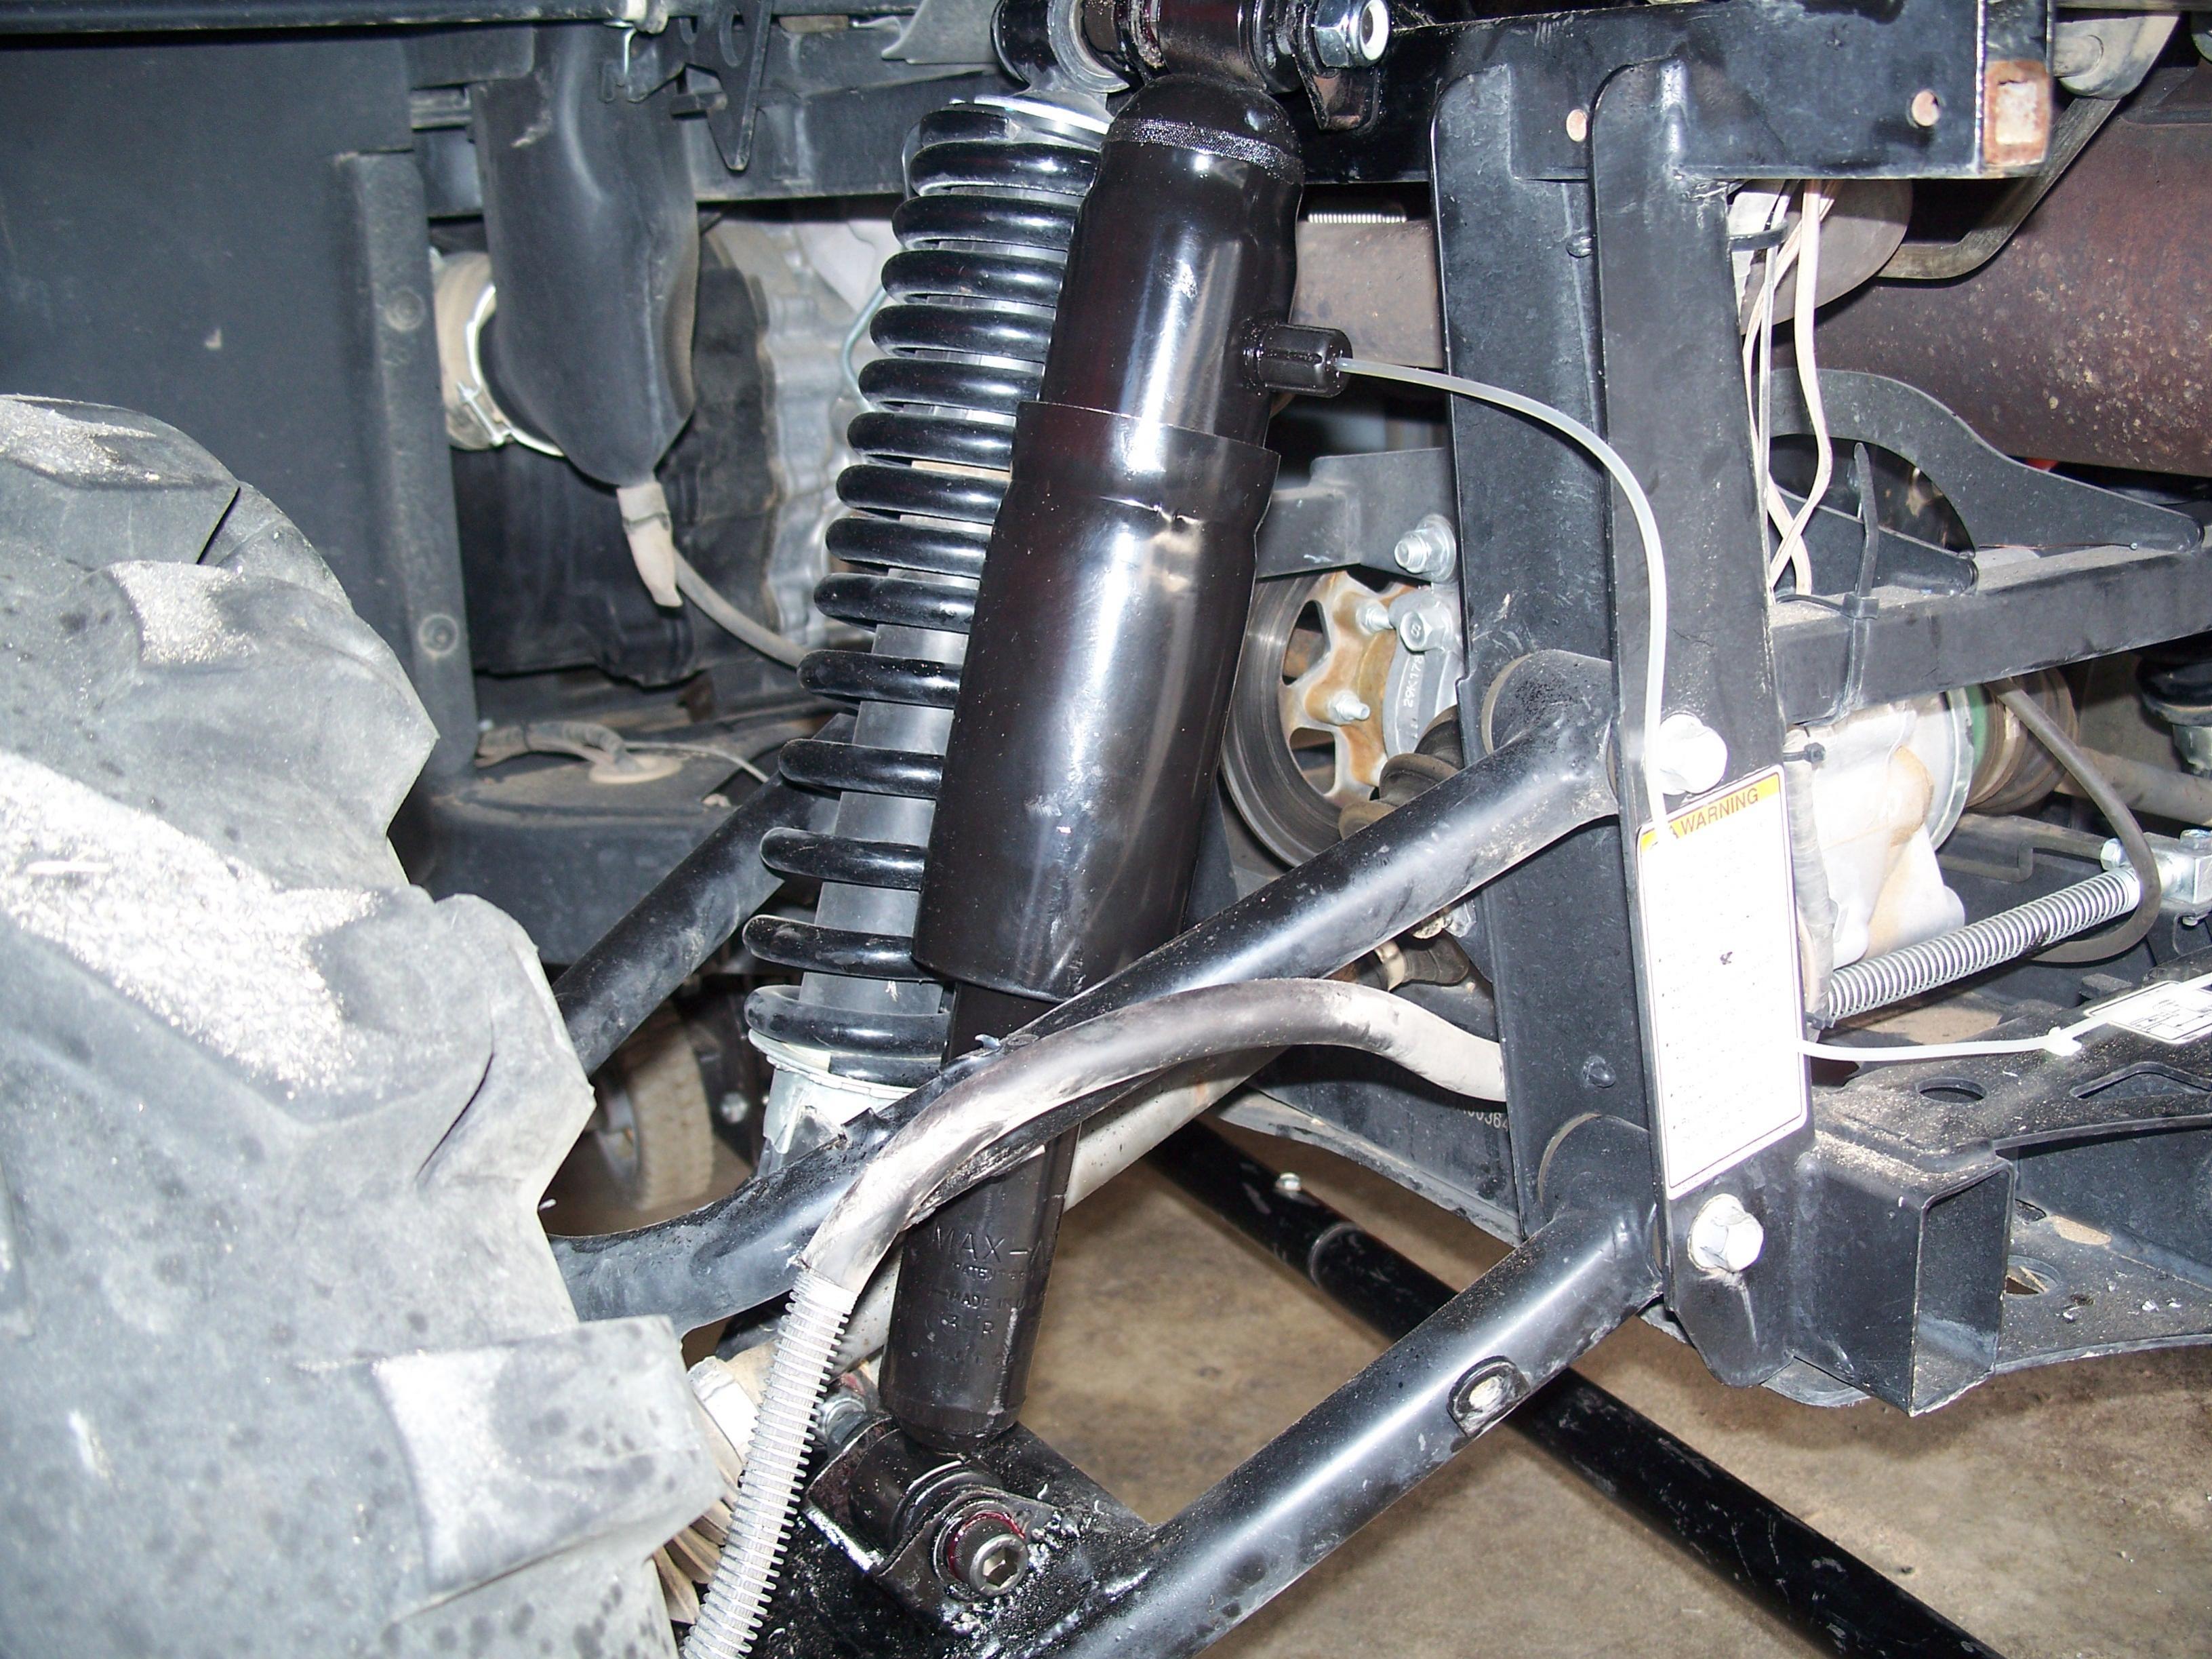 Yamaha Rhino 450 Specs 2006 Rear Brake Diagram On Piston Caliper Click Image For Larger Version Name Views Size 3263x2447